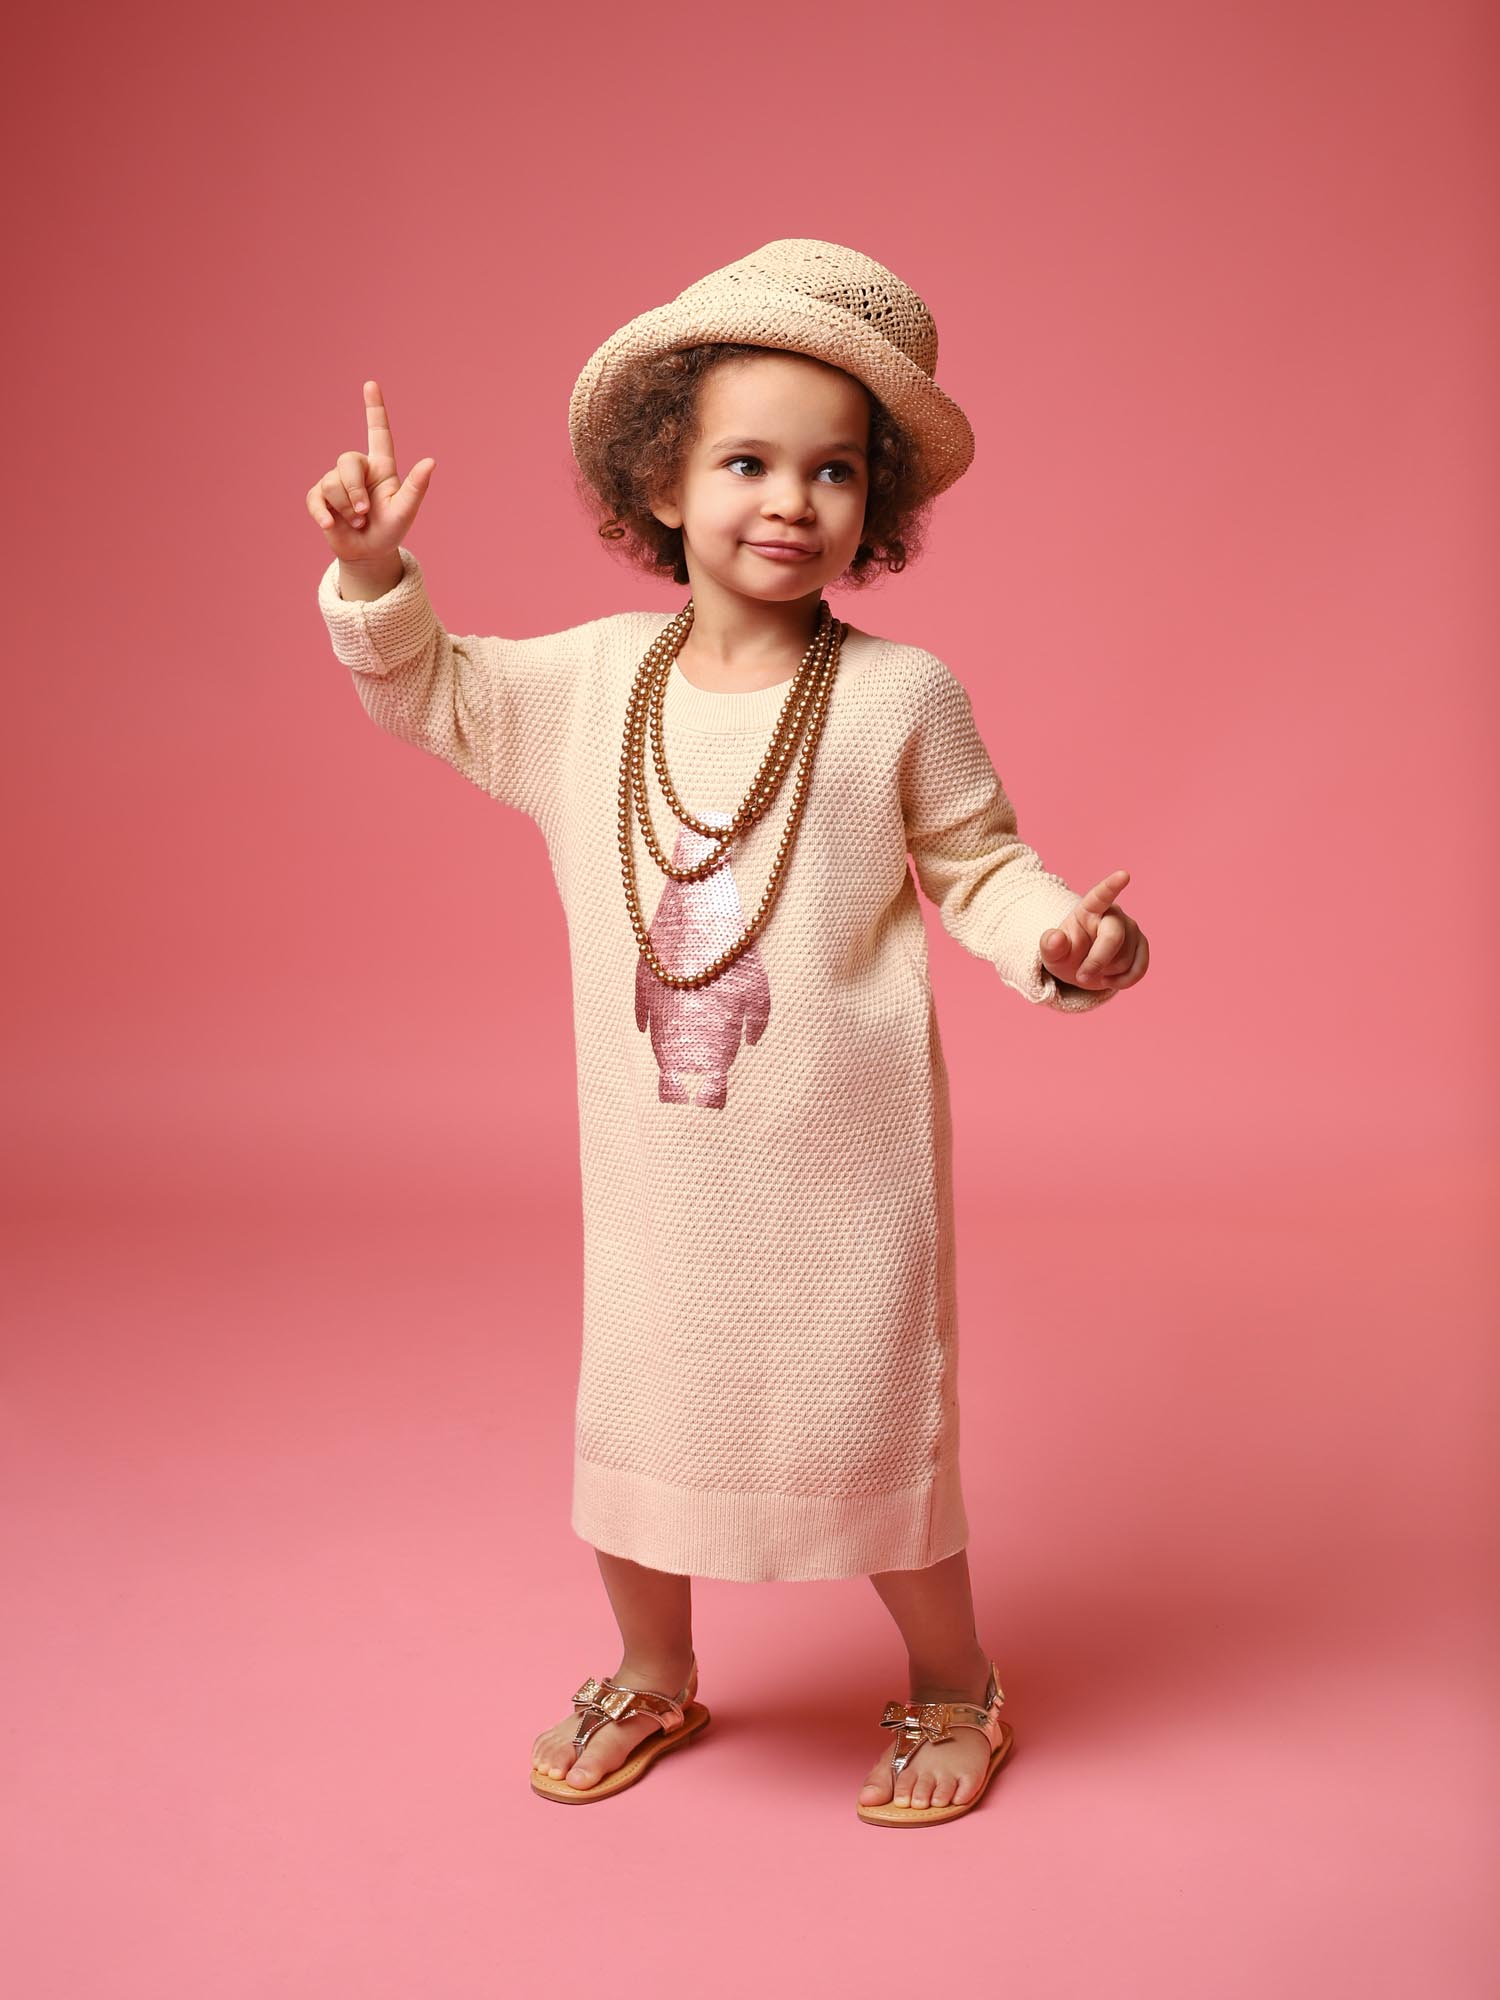 nyc-photographers-kids-modeling-10018.jpg